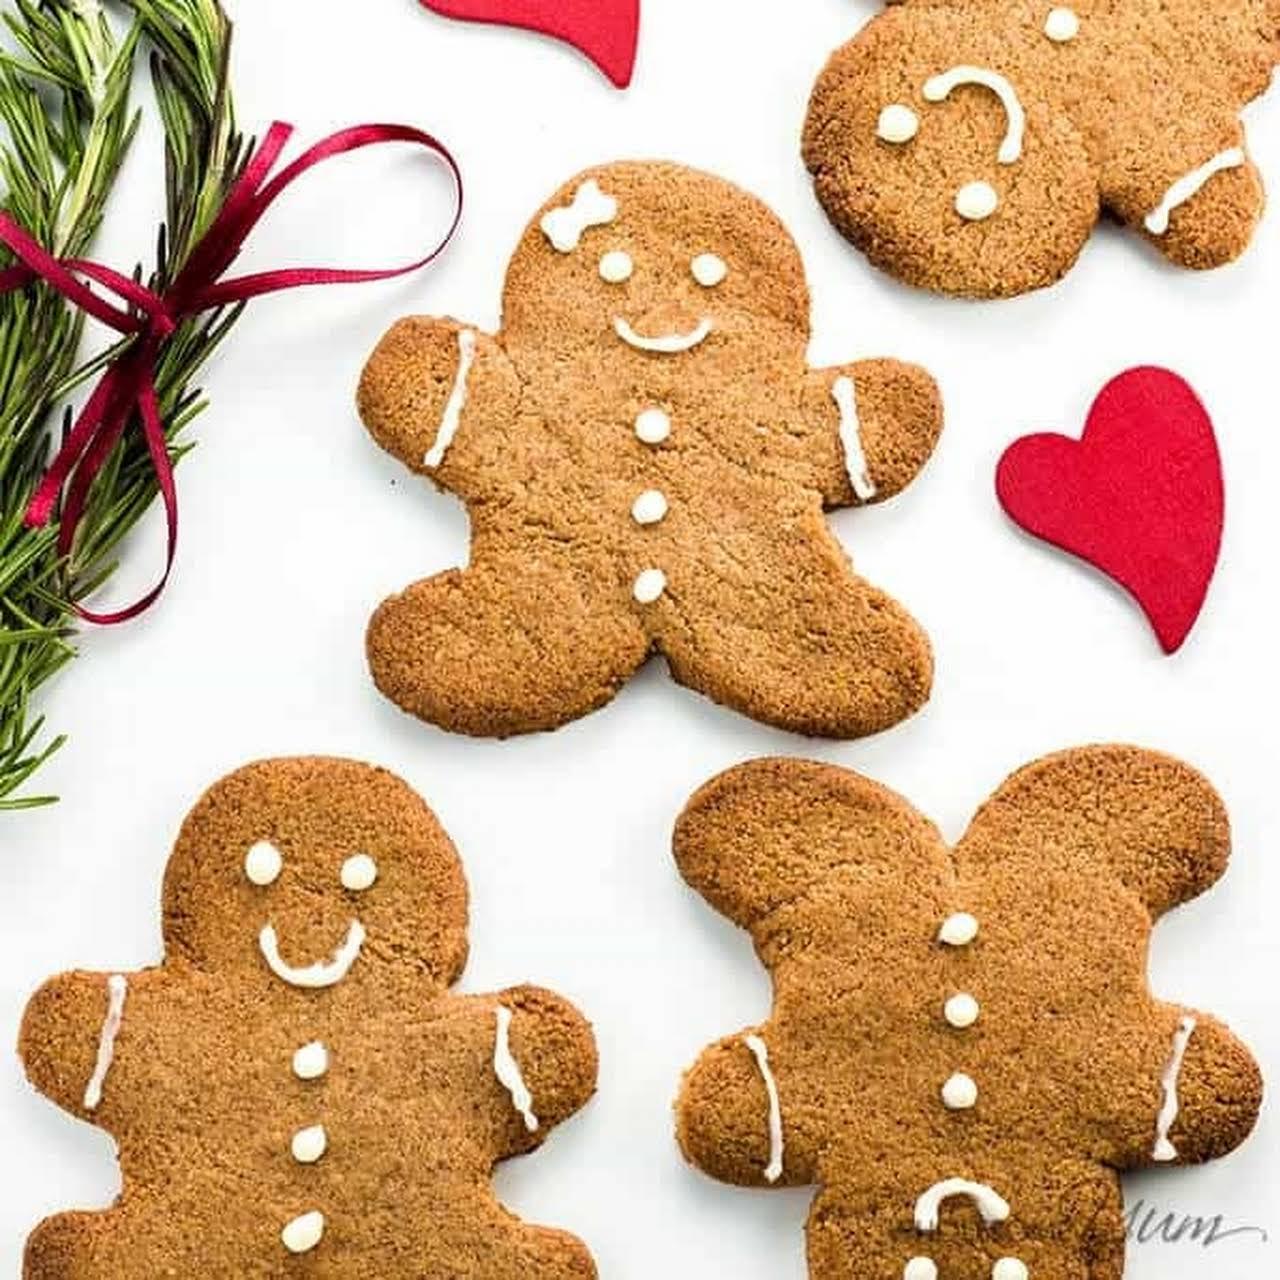 Sugar-free Gingerbread Cookies (Low Carb, Paleo)